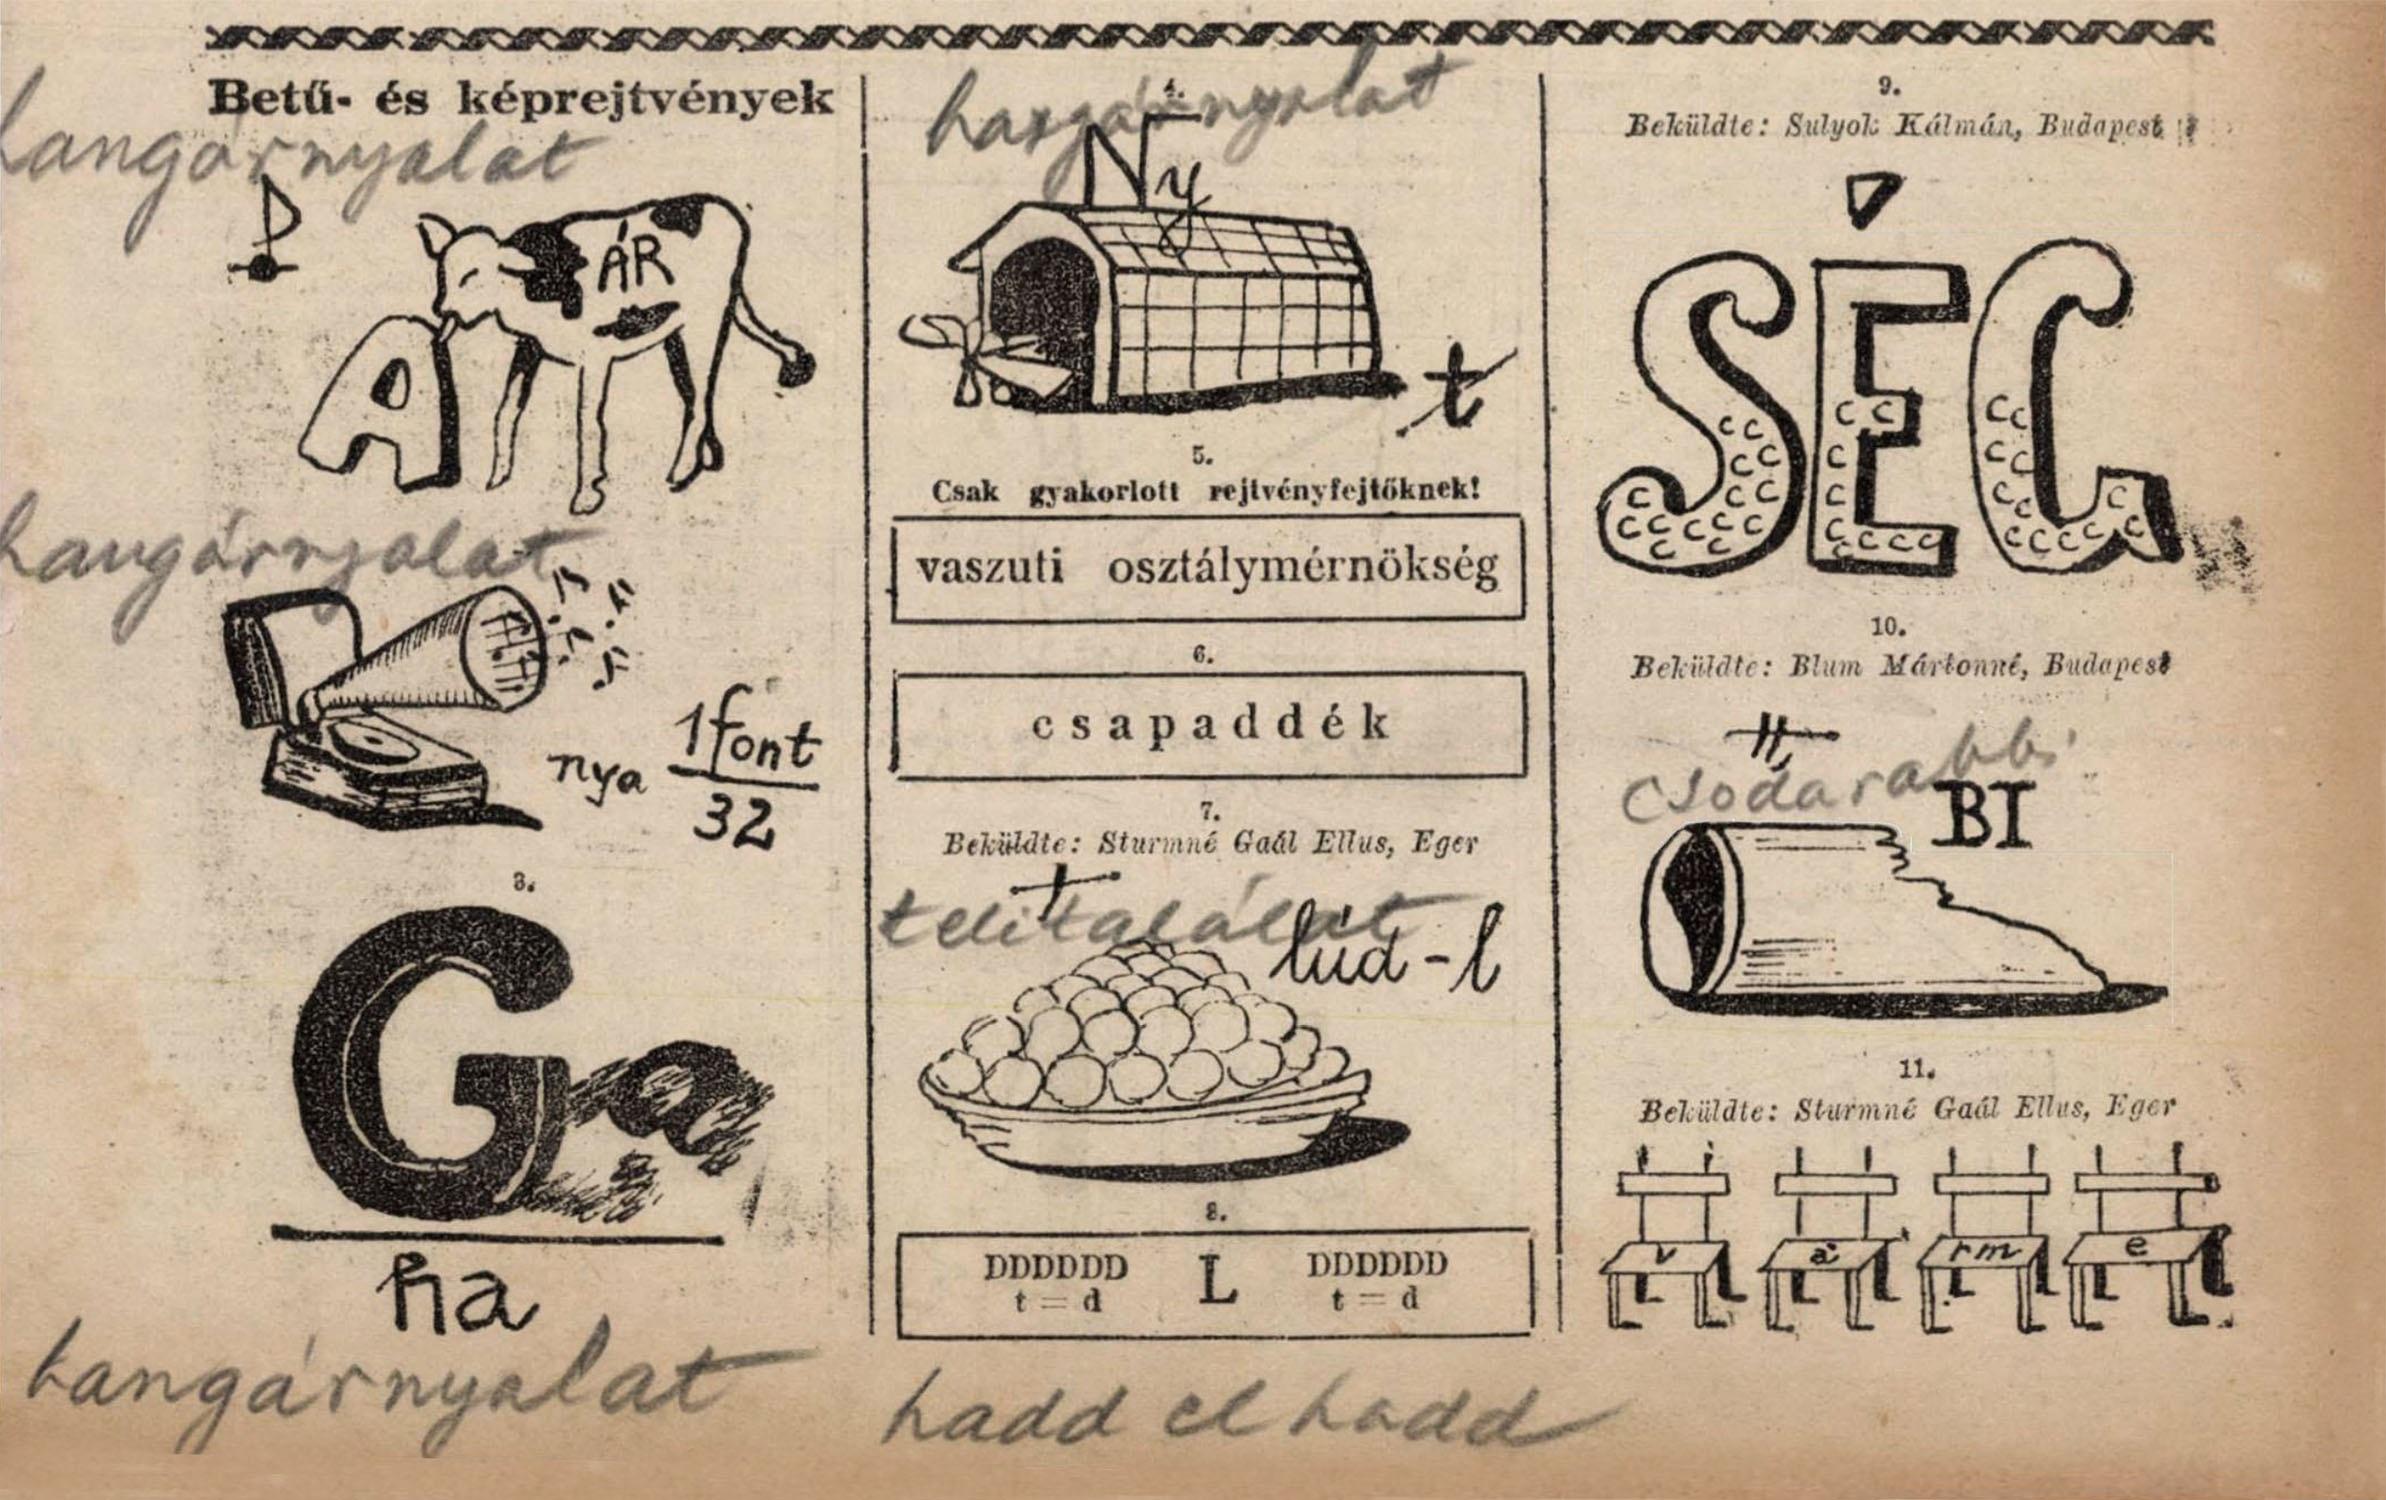 budapestihirlapvasarnapja_1929_1_pages333-333.jpg